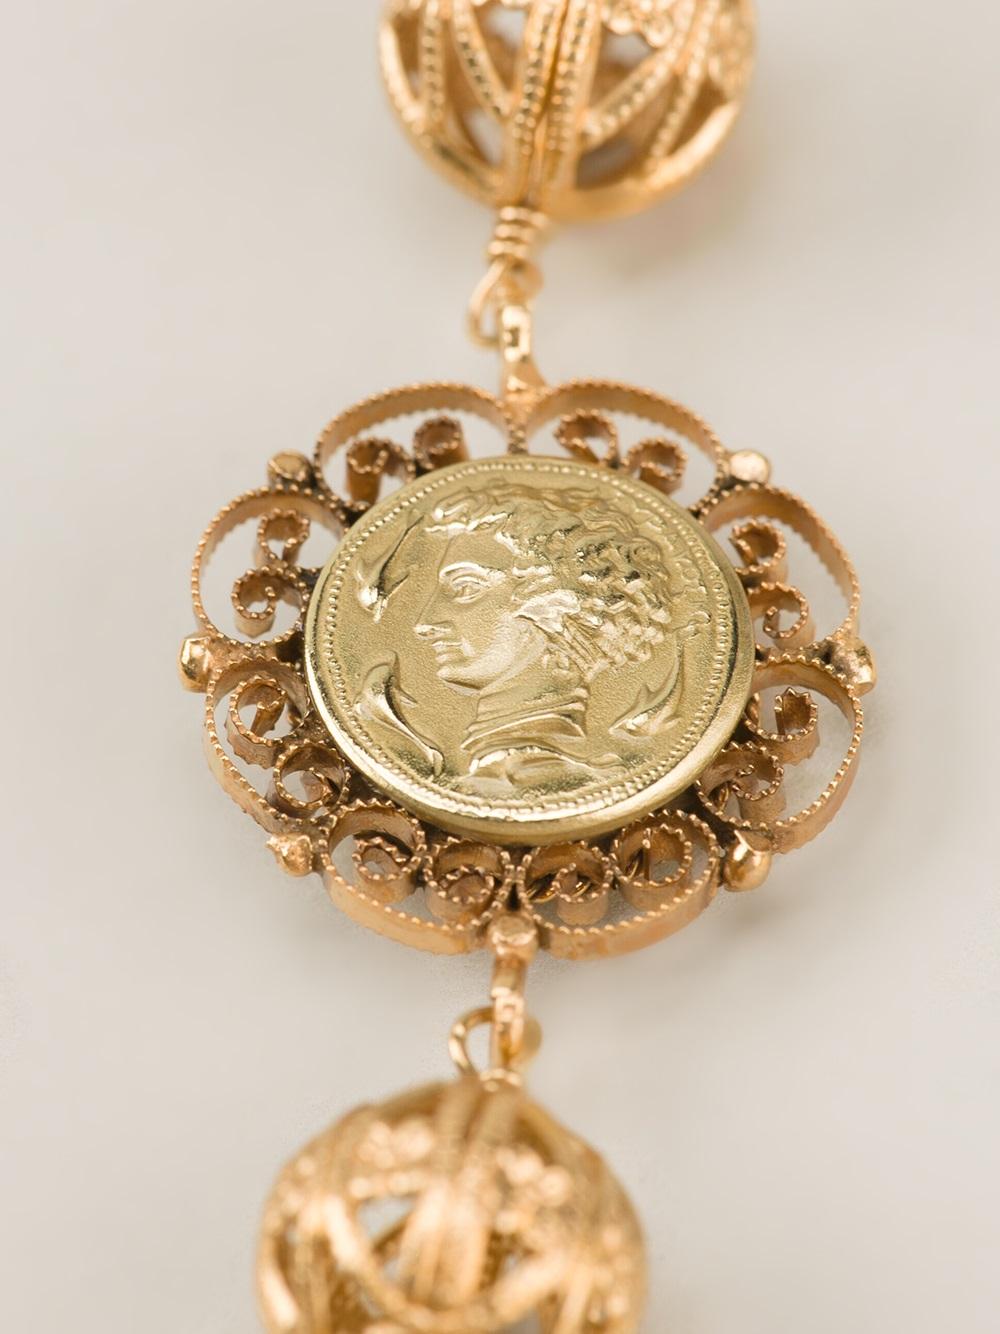 Dolce & Gabbana Cameo Coin Necklace in Metallic